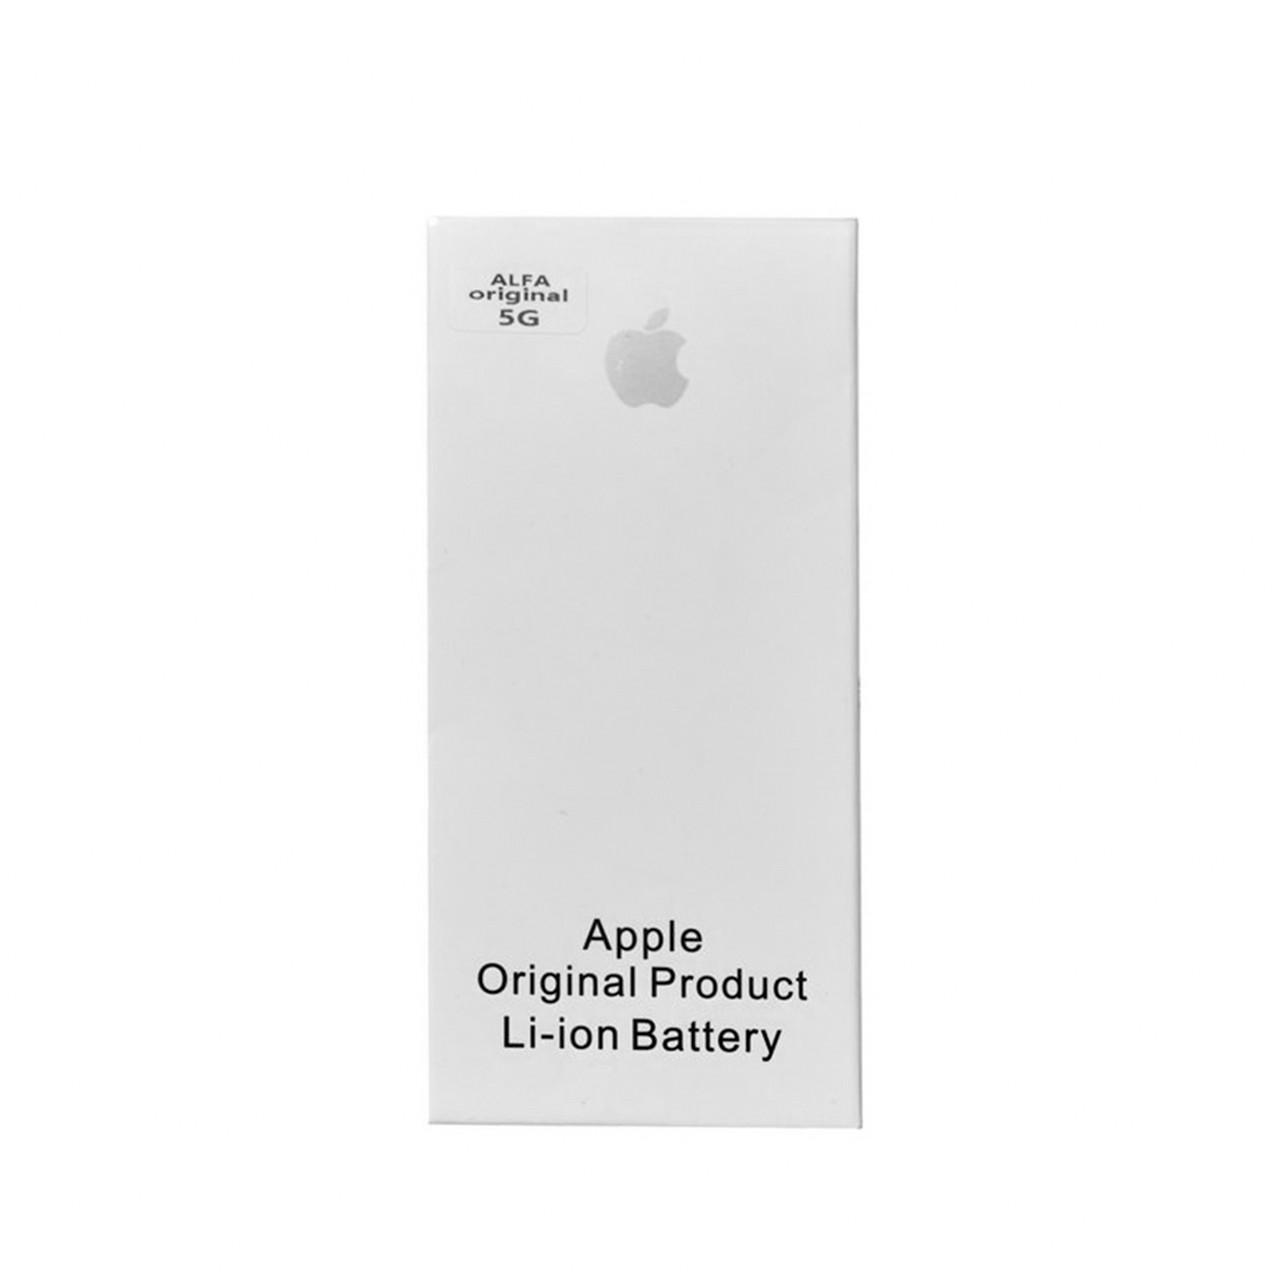 Аккумулятор Apple iPhone 5G AAA Caution